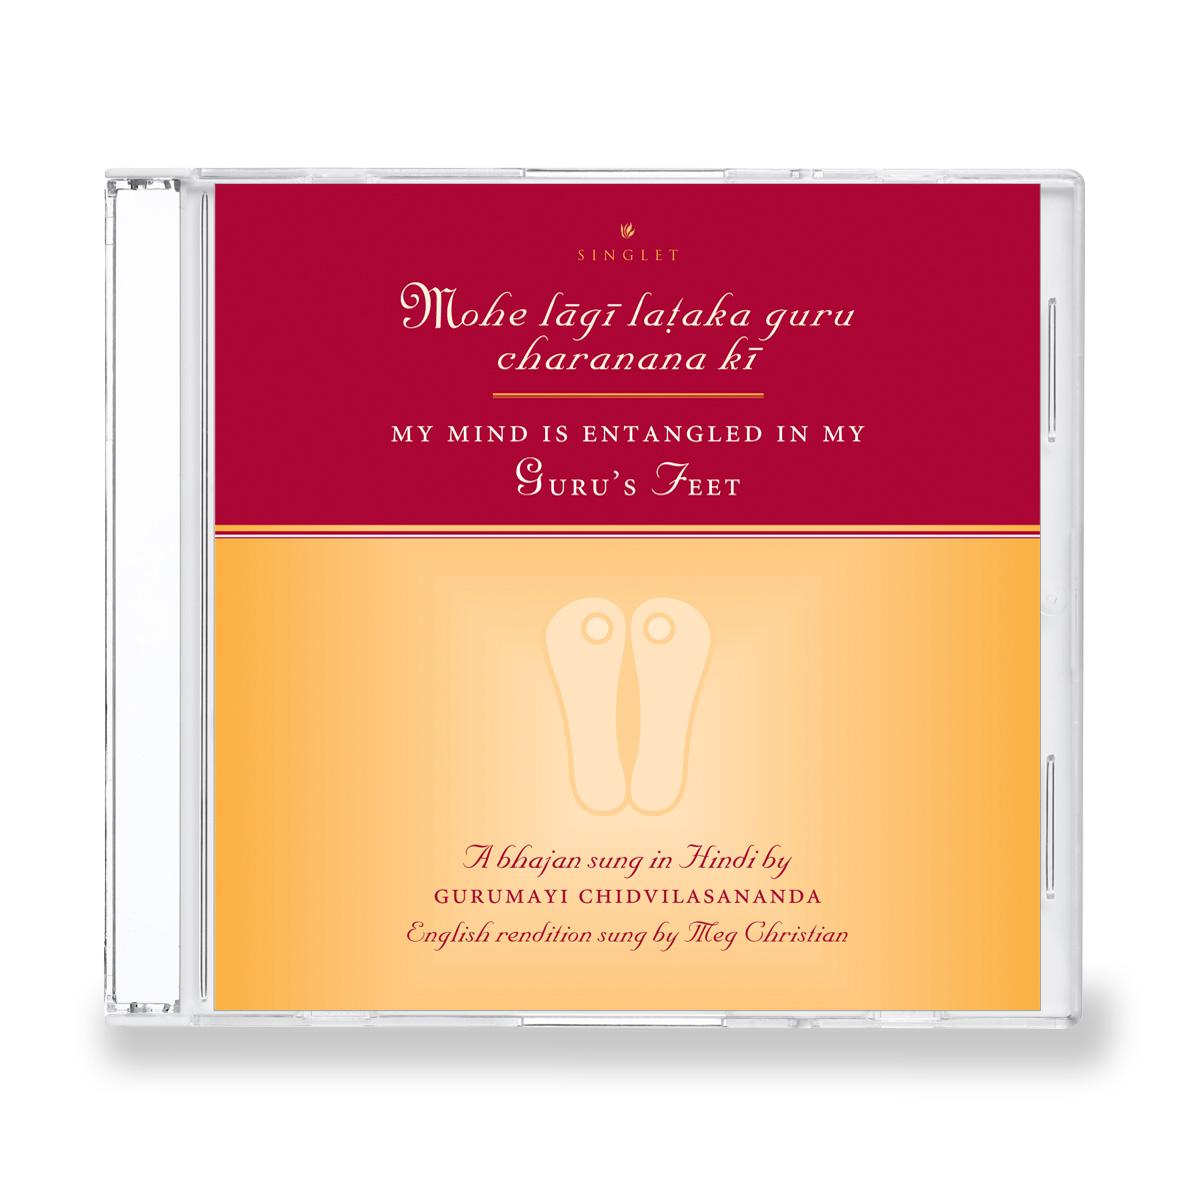 CD - Shri Guru Gita